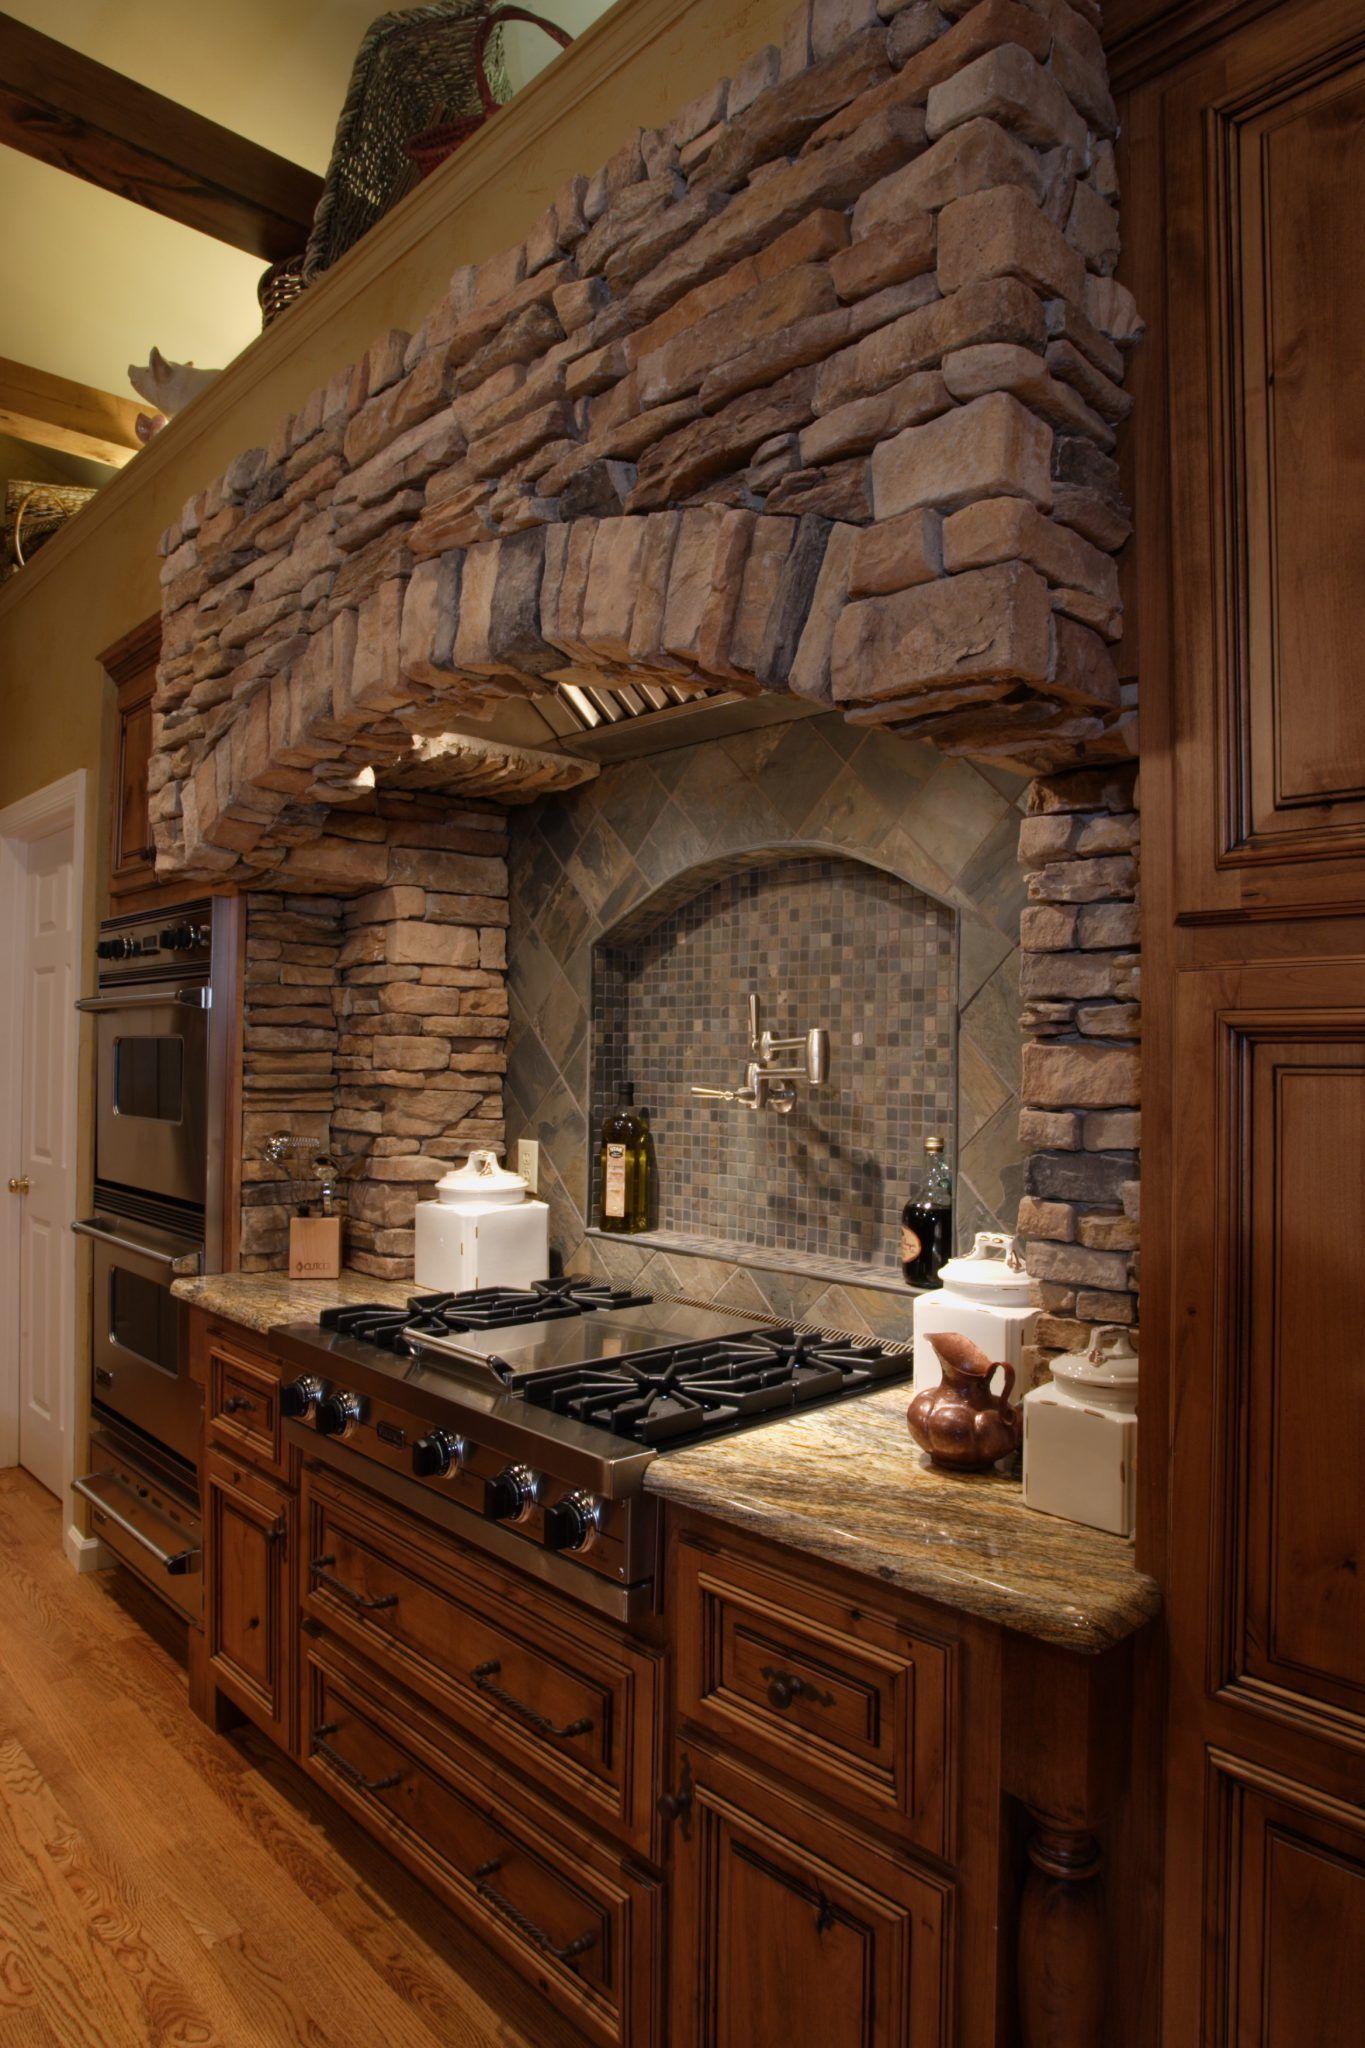 Kitchen Design Trends: Range Backsplashes - Callie